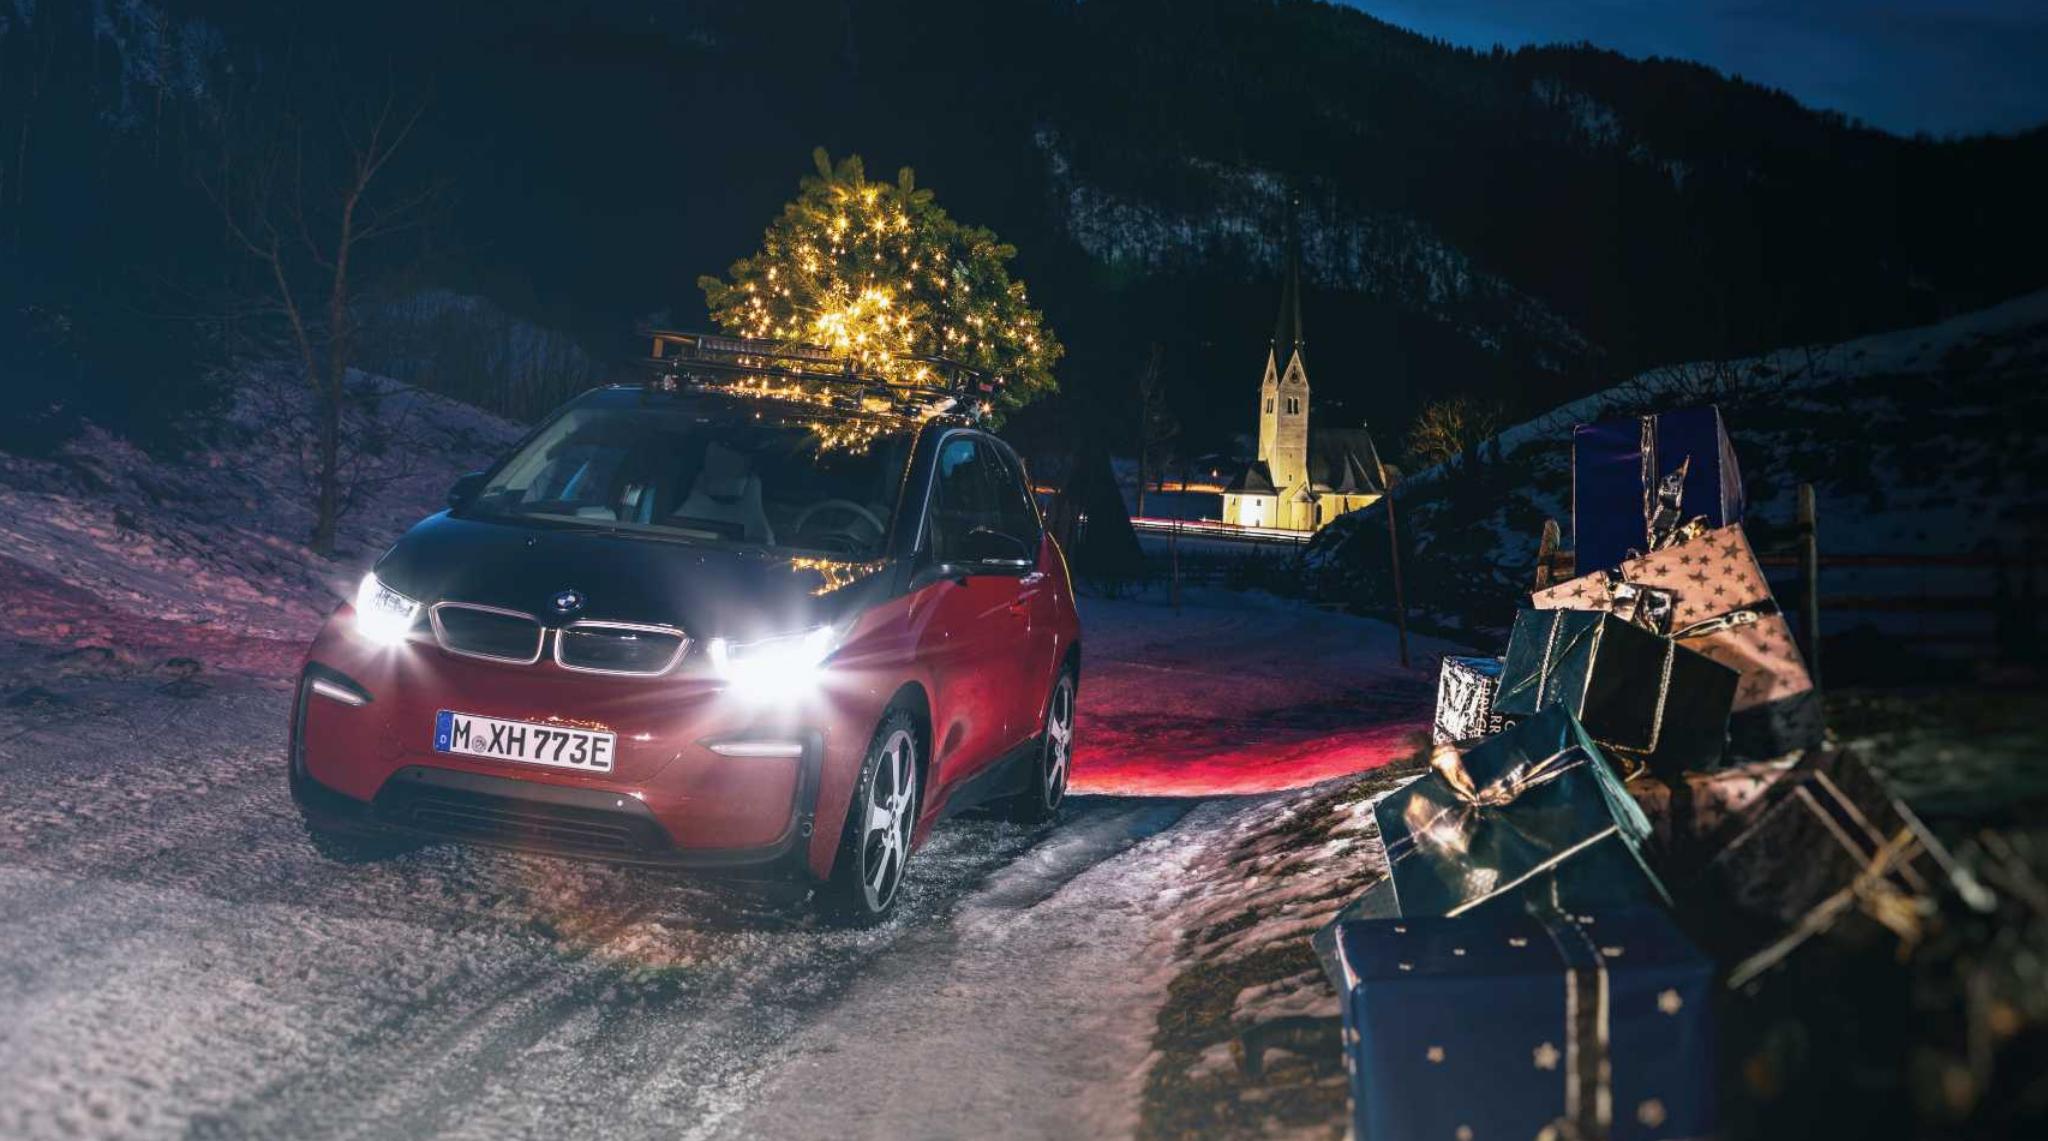 BMW Christmas Tree On Roof